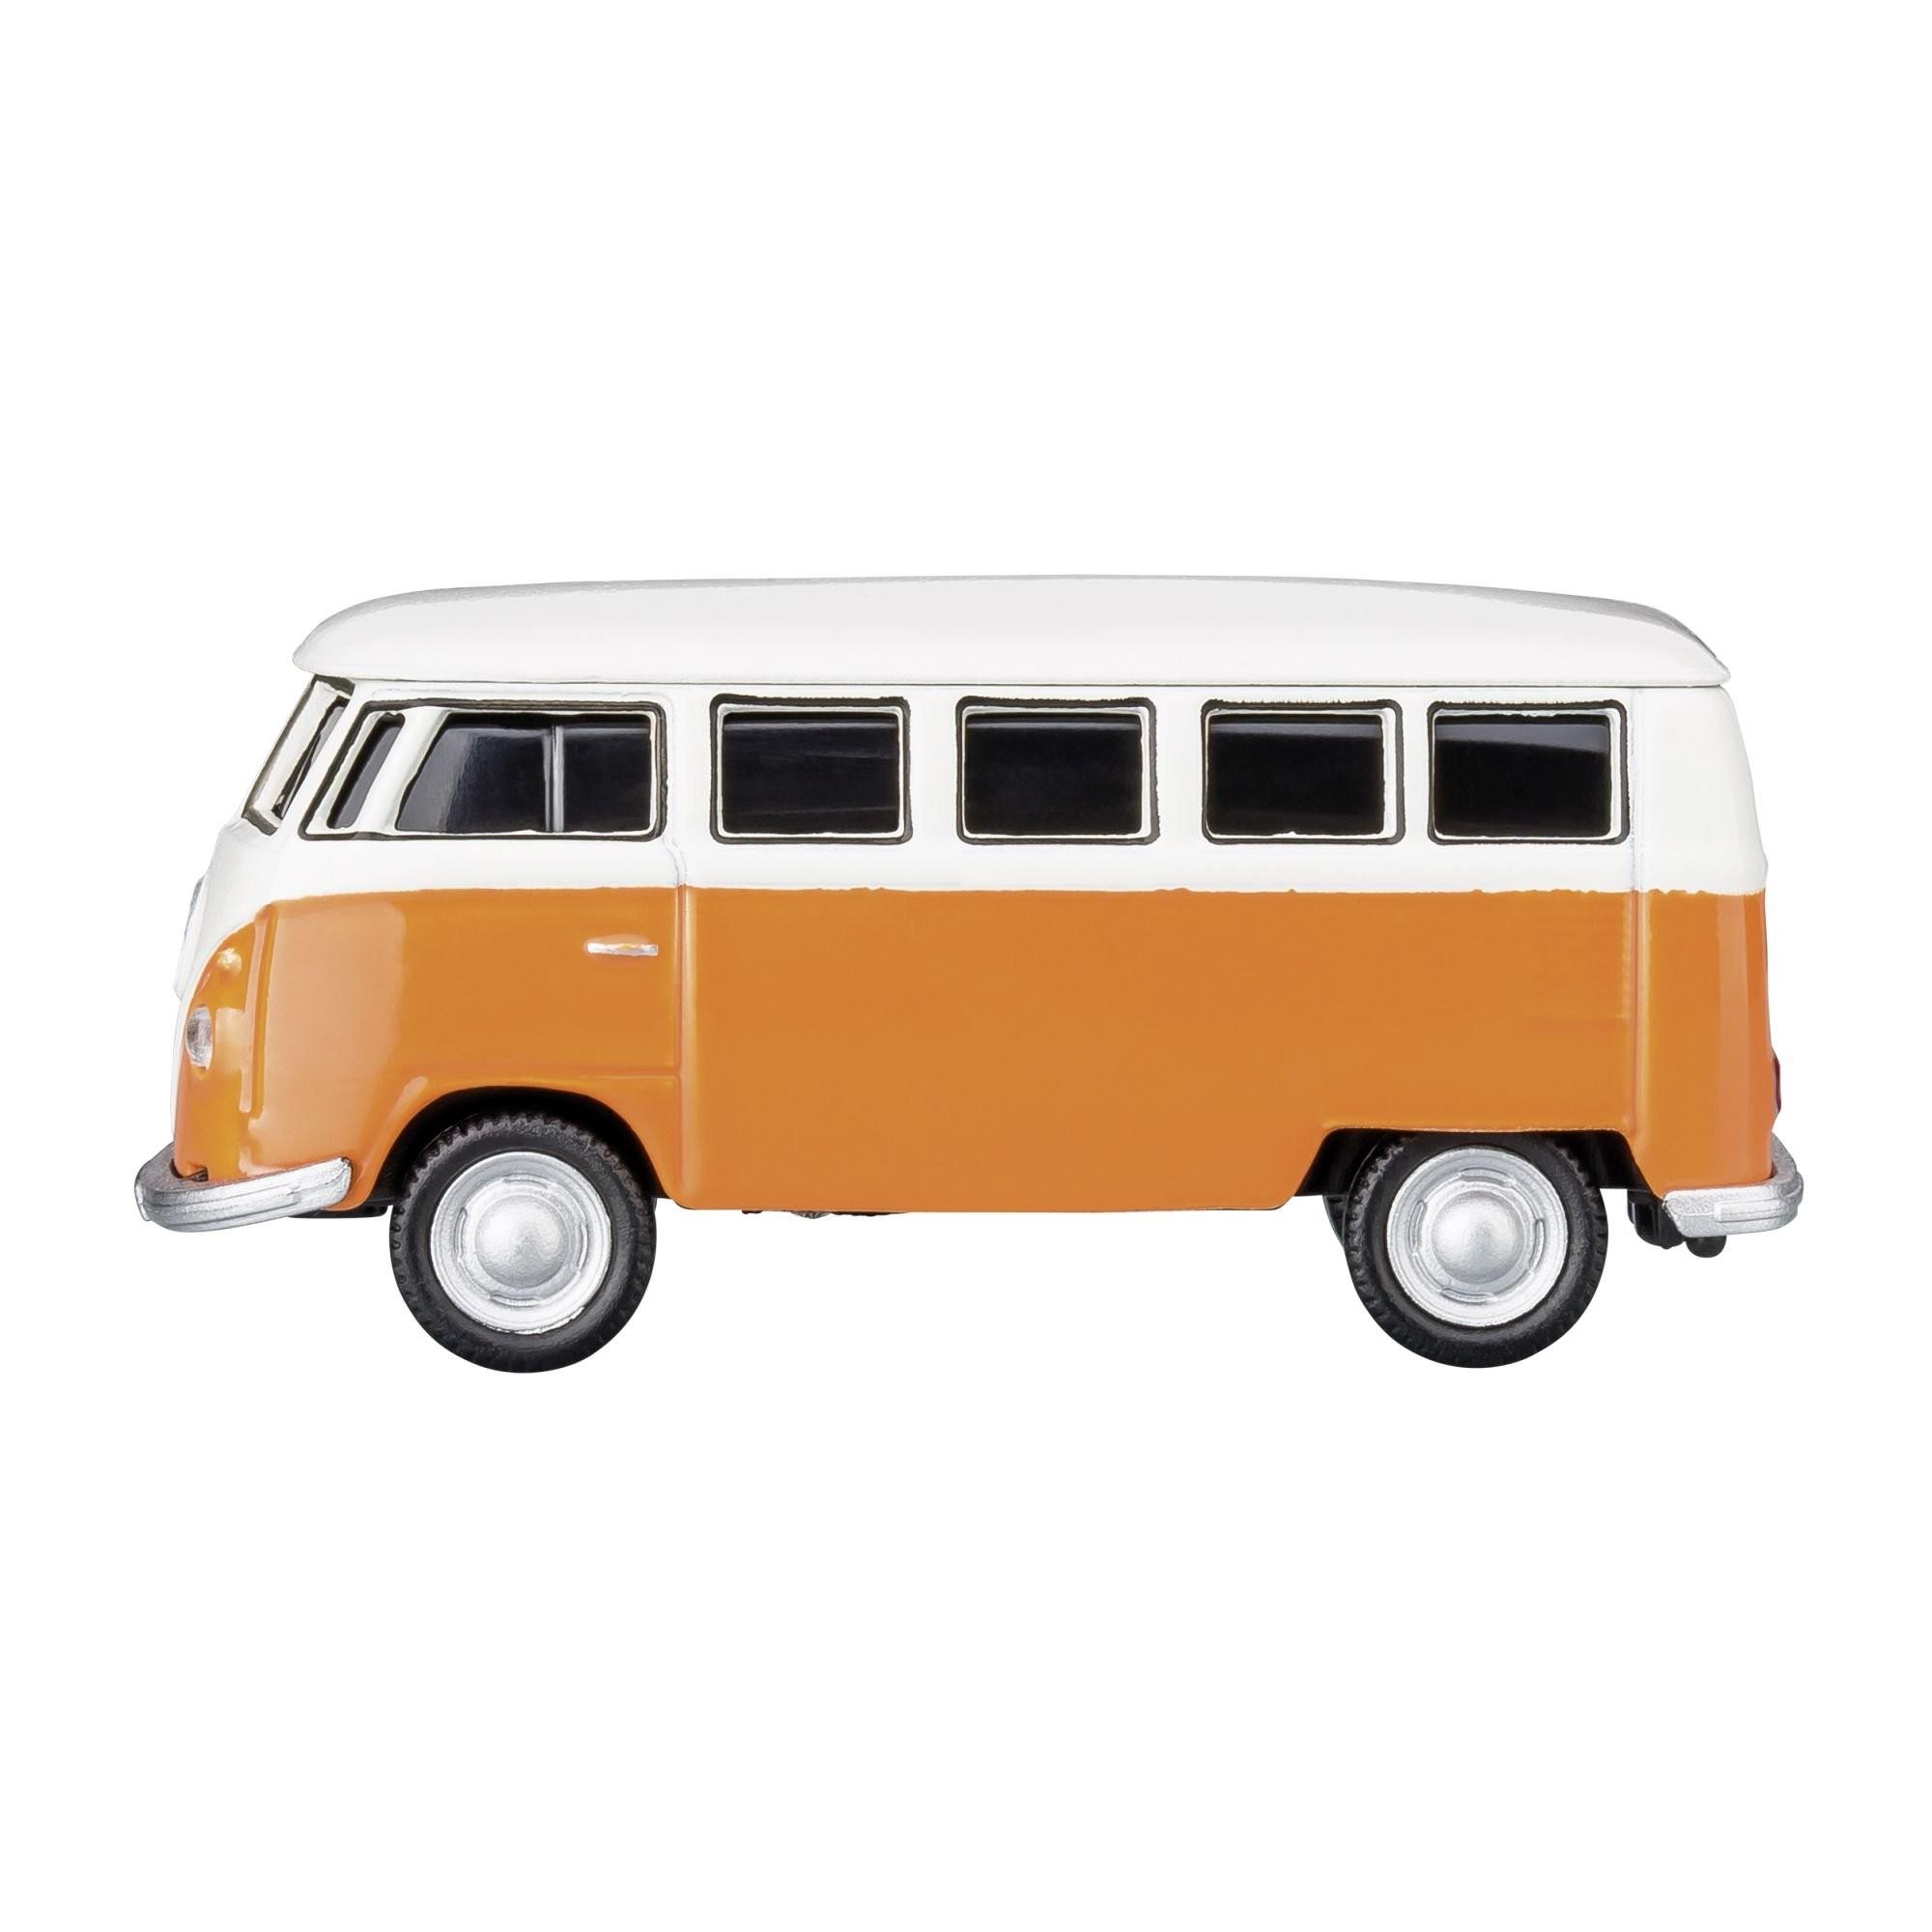 USB flash drive VW Bus T1 1:72 ORANGE 16GB, View 8